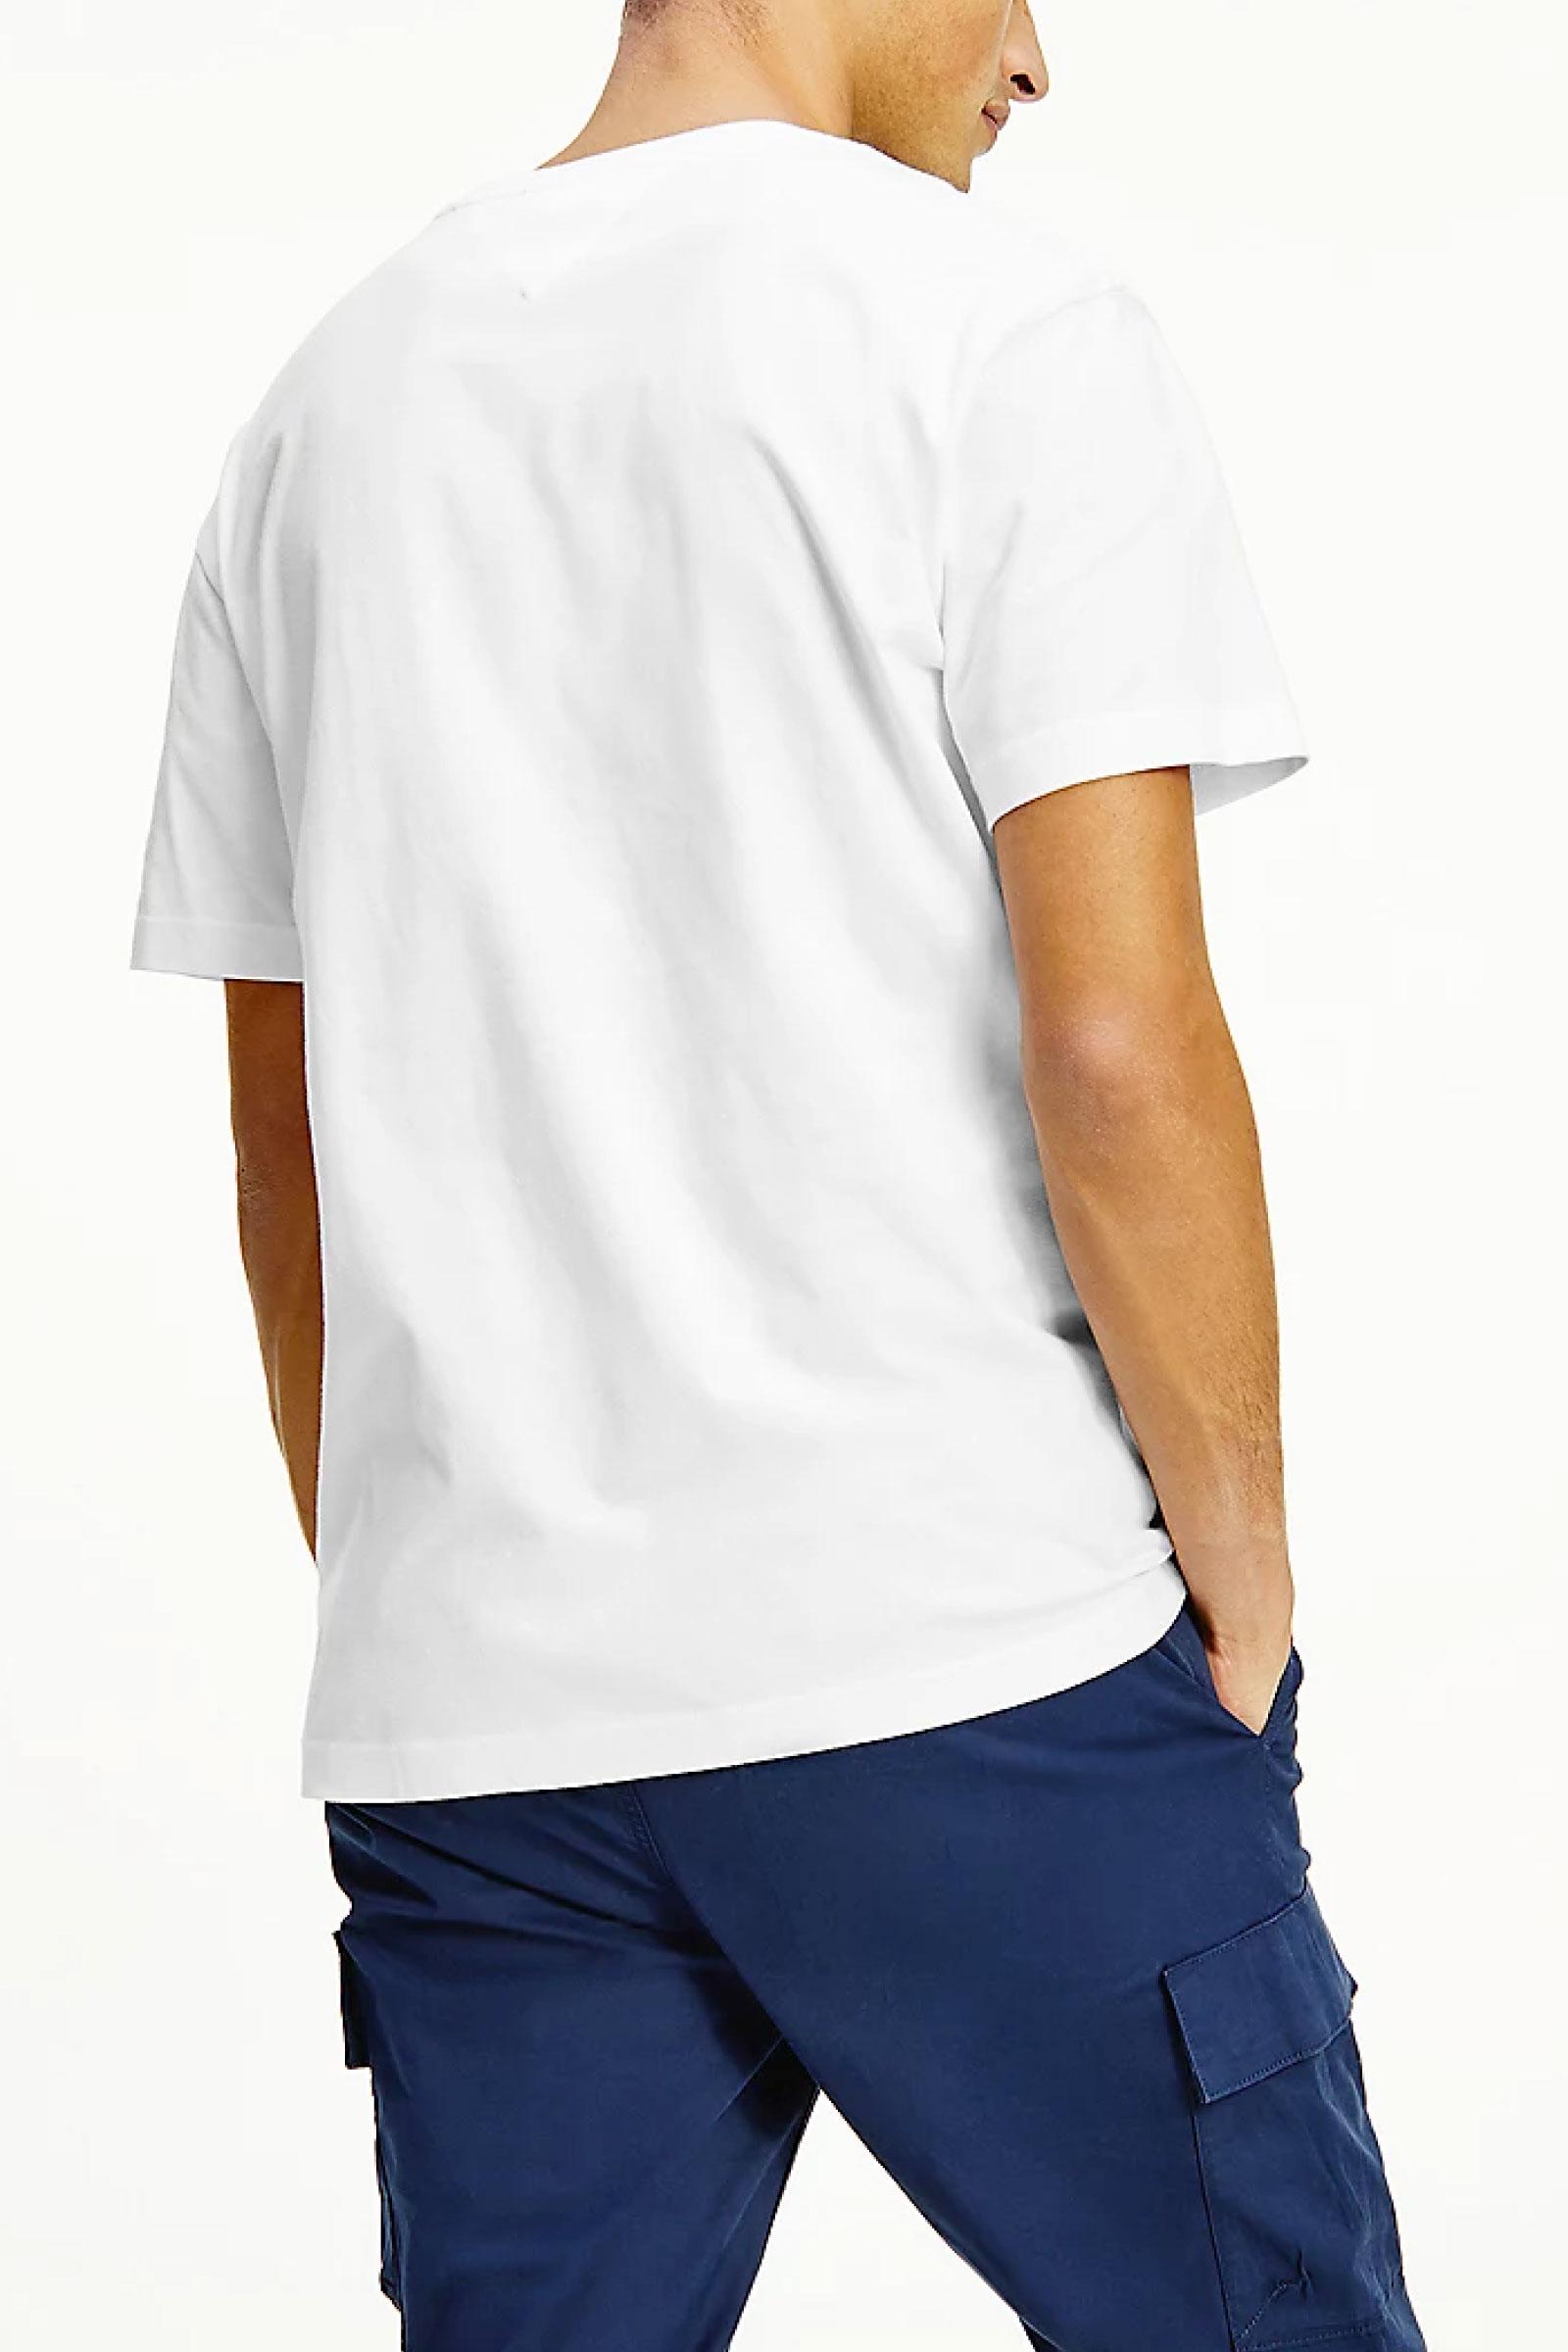 TOMMY JEANS T-Shirt Uomo TOMMY JEANS | T-Shirt | DM0DM10219YBR